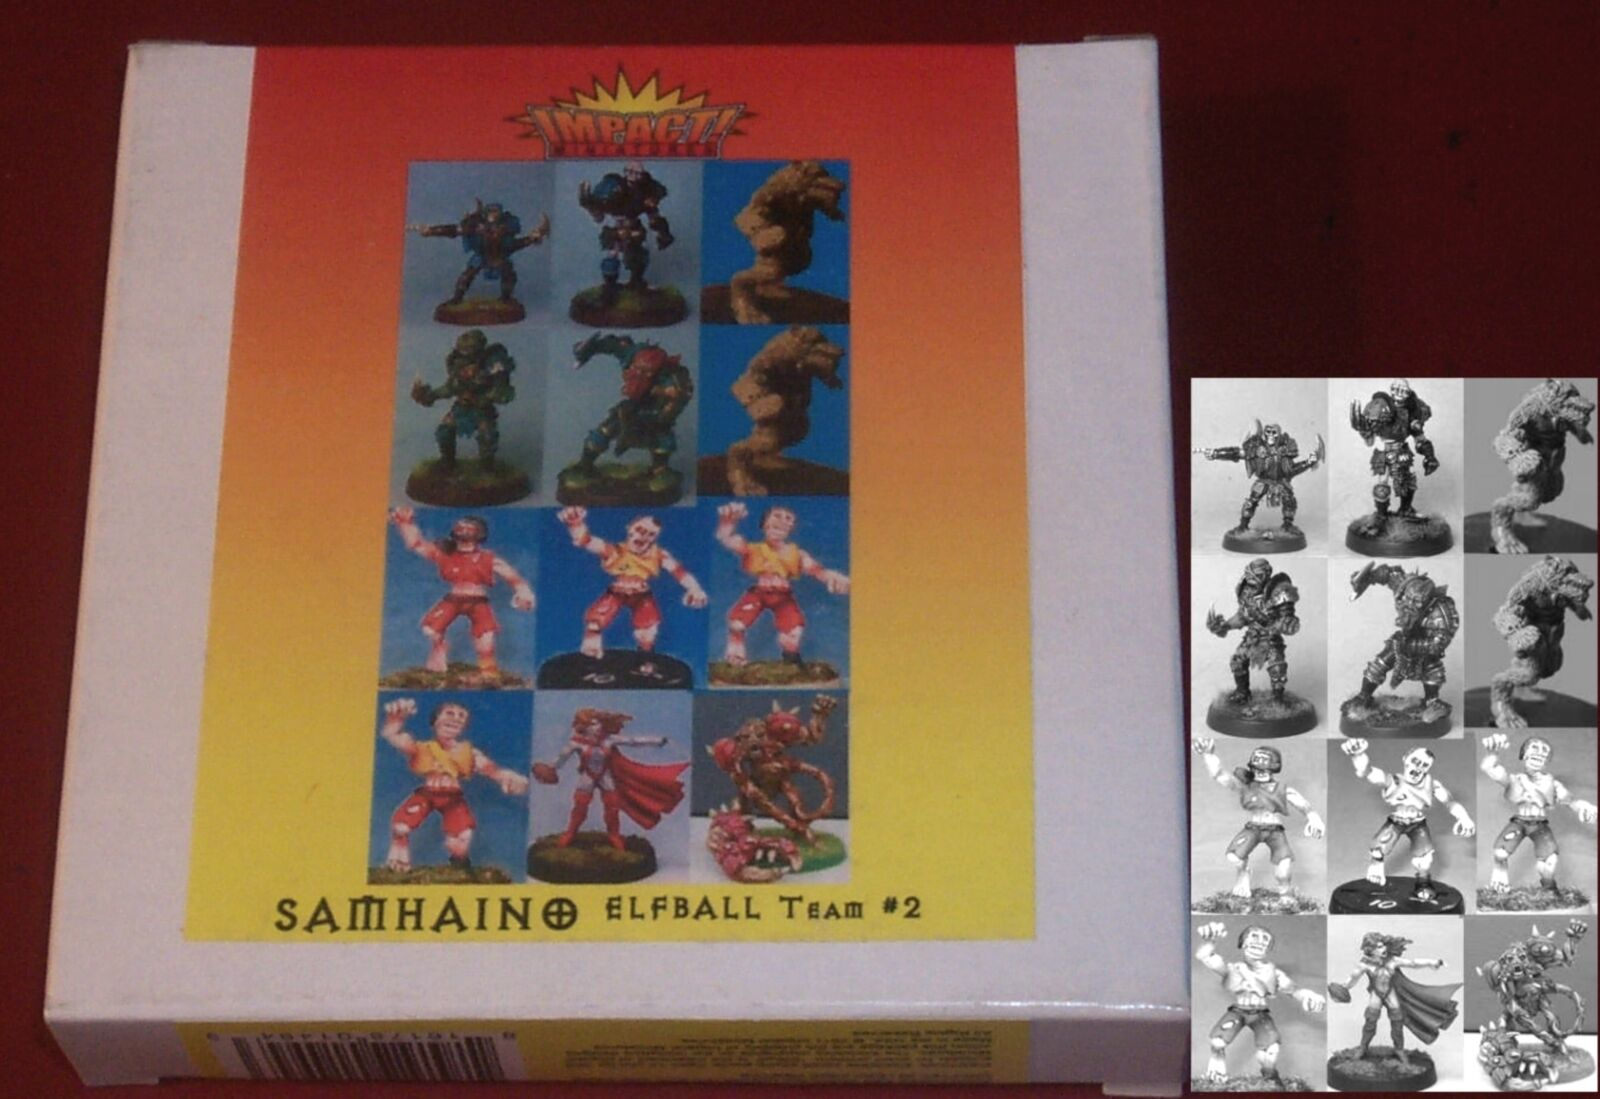 Elfball SM-ETM2 Samhaino Base Team (12) Miniatures Fantasy Football Players